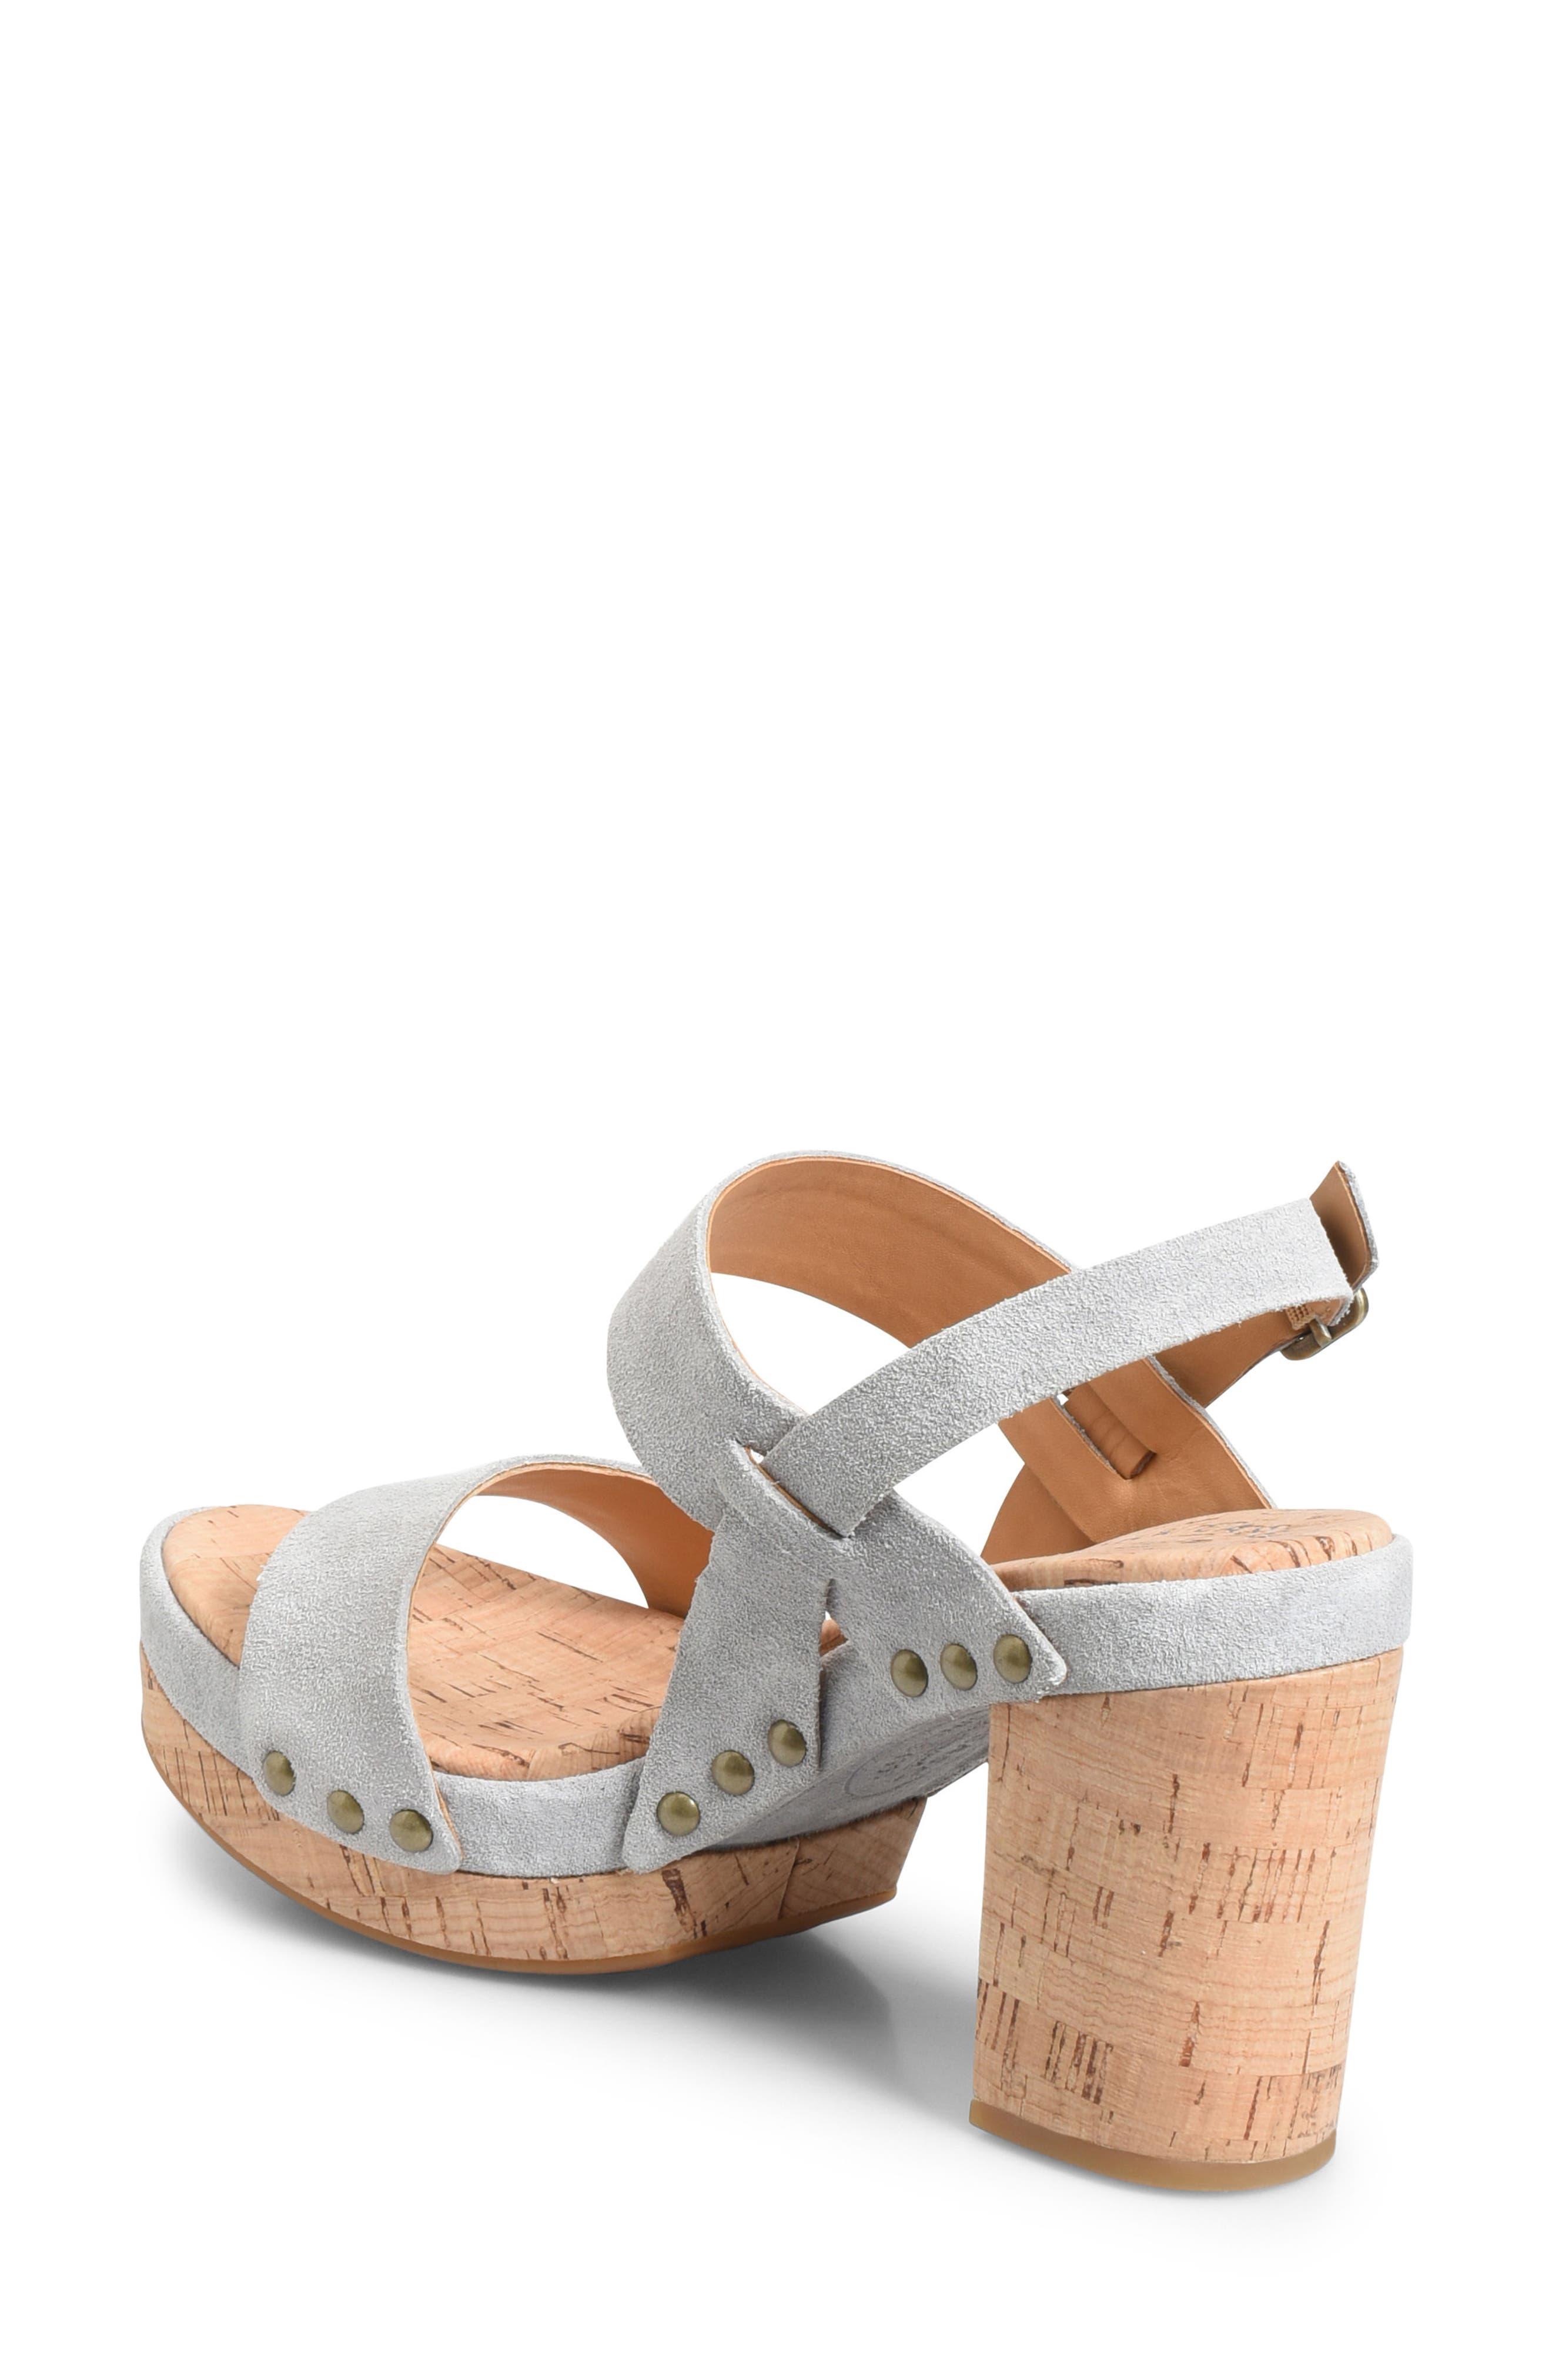 Palmdale Platform Sandal,                             Alternate thumbnail 2, color,                             GREY SUEDE